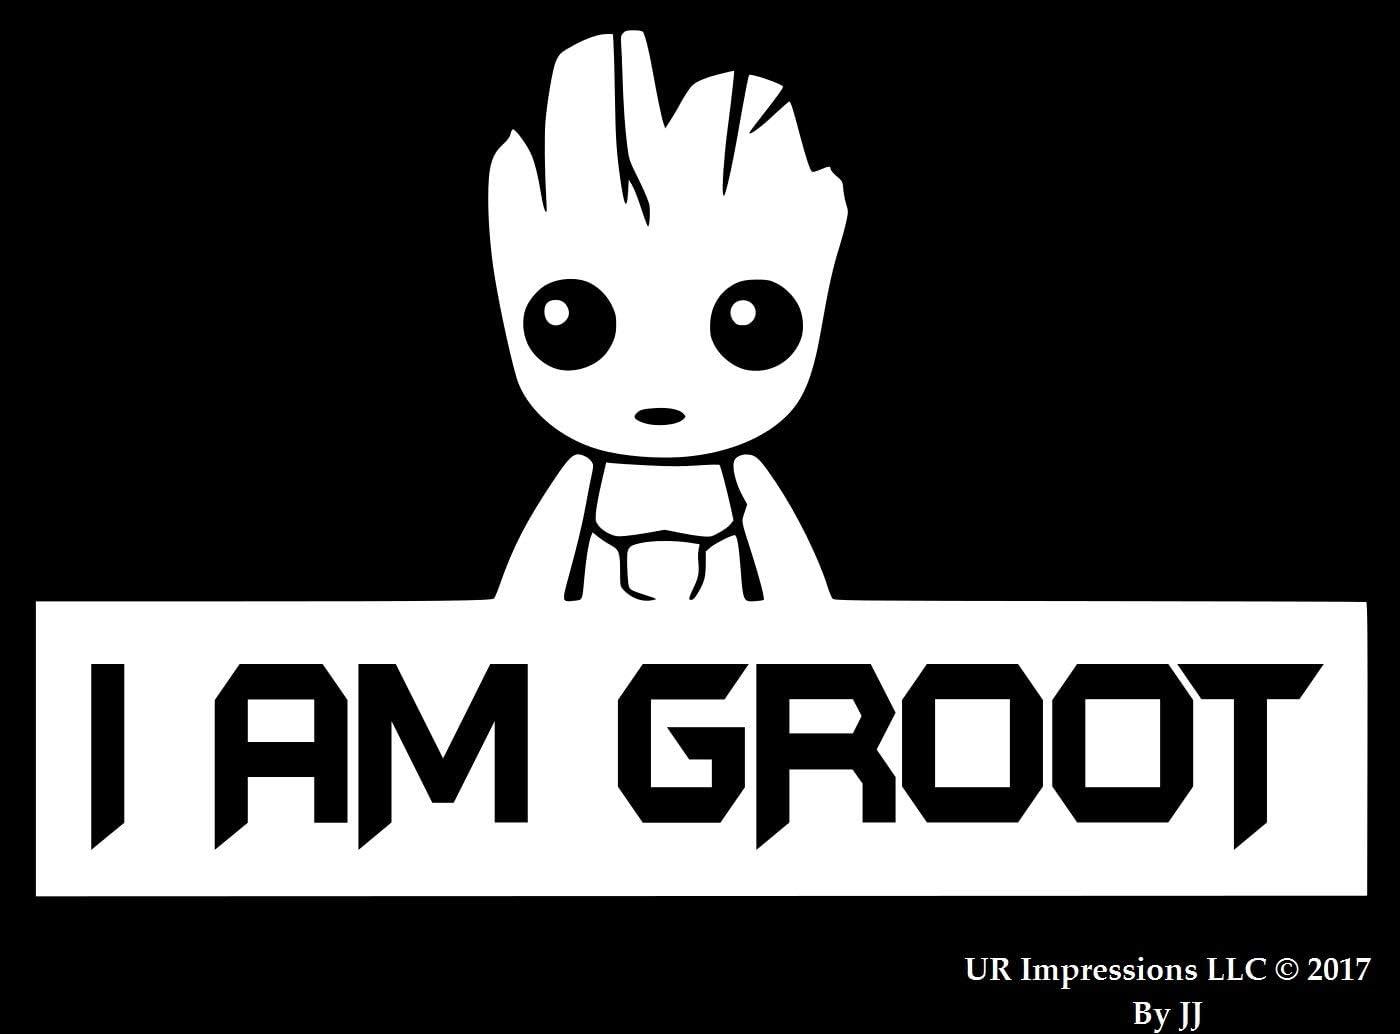 UR Impressions I Am Groot Decal Vinyl Sticker Graphics for Cars Trucks SUV Vans Walls Windows Laptop Tablet|White|7.5 X 5 inch|JJURI080